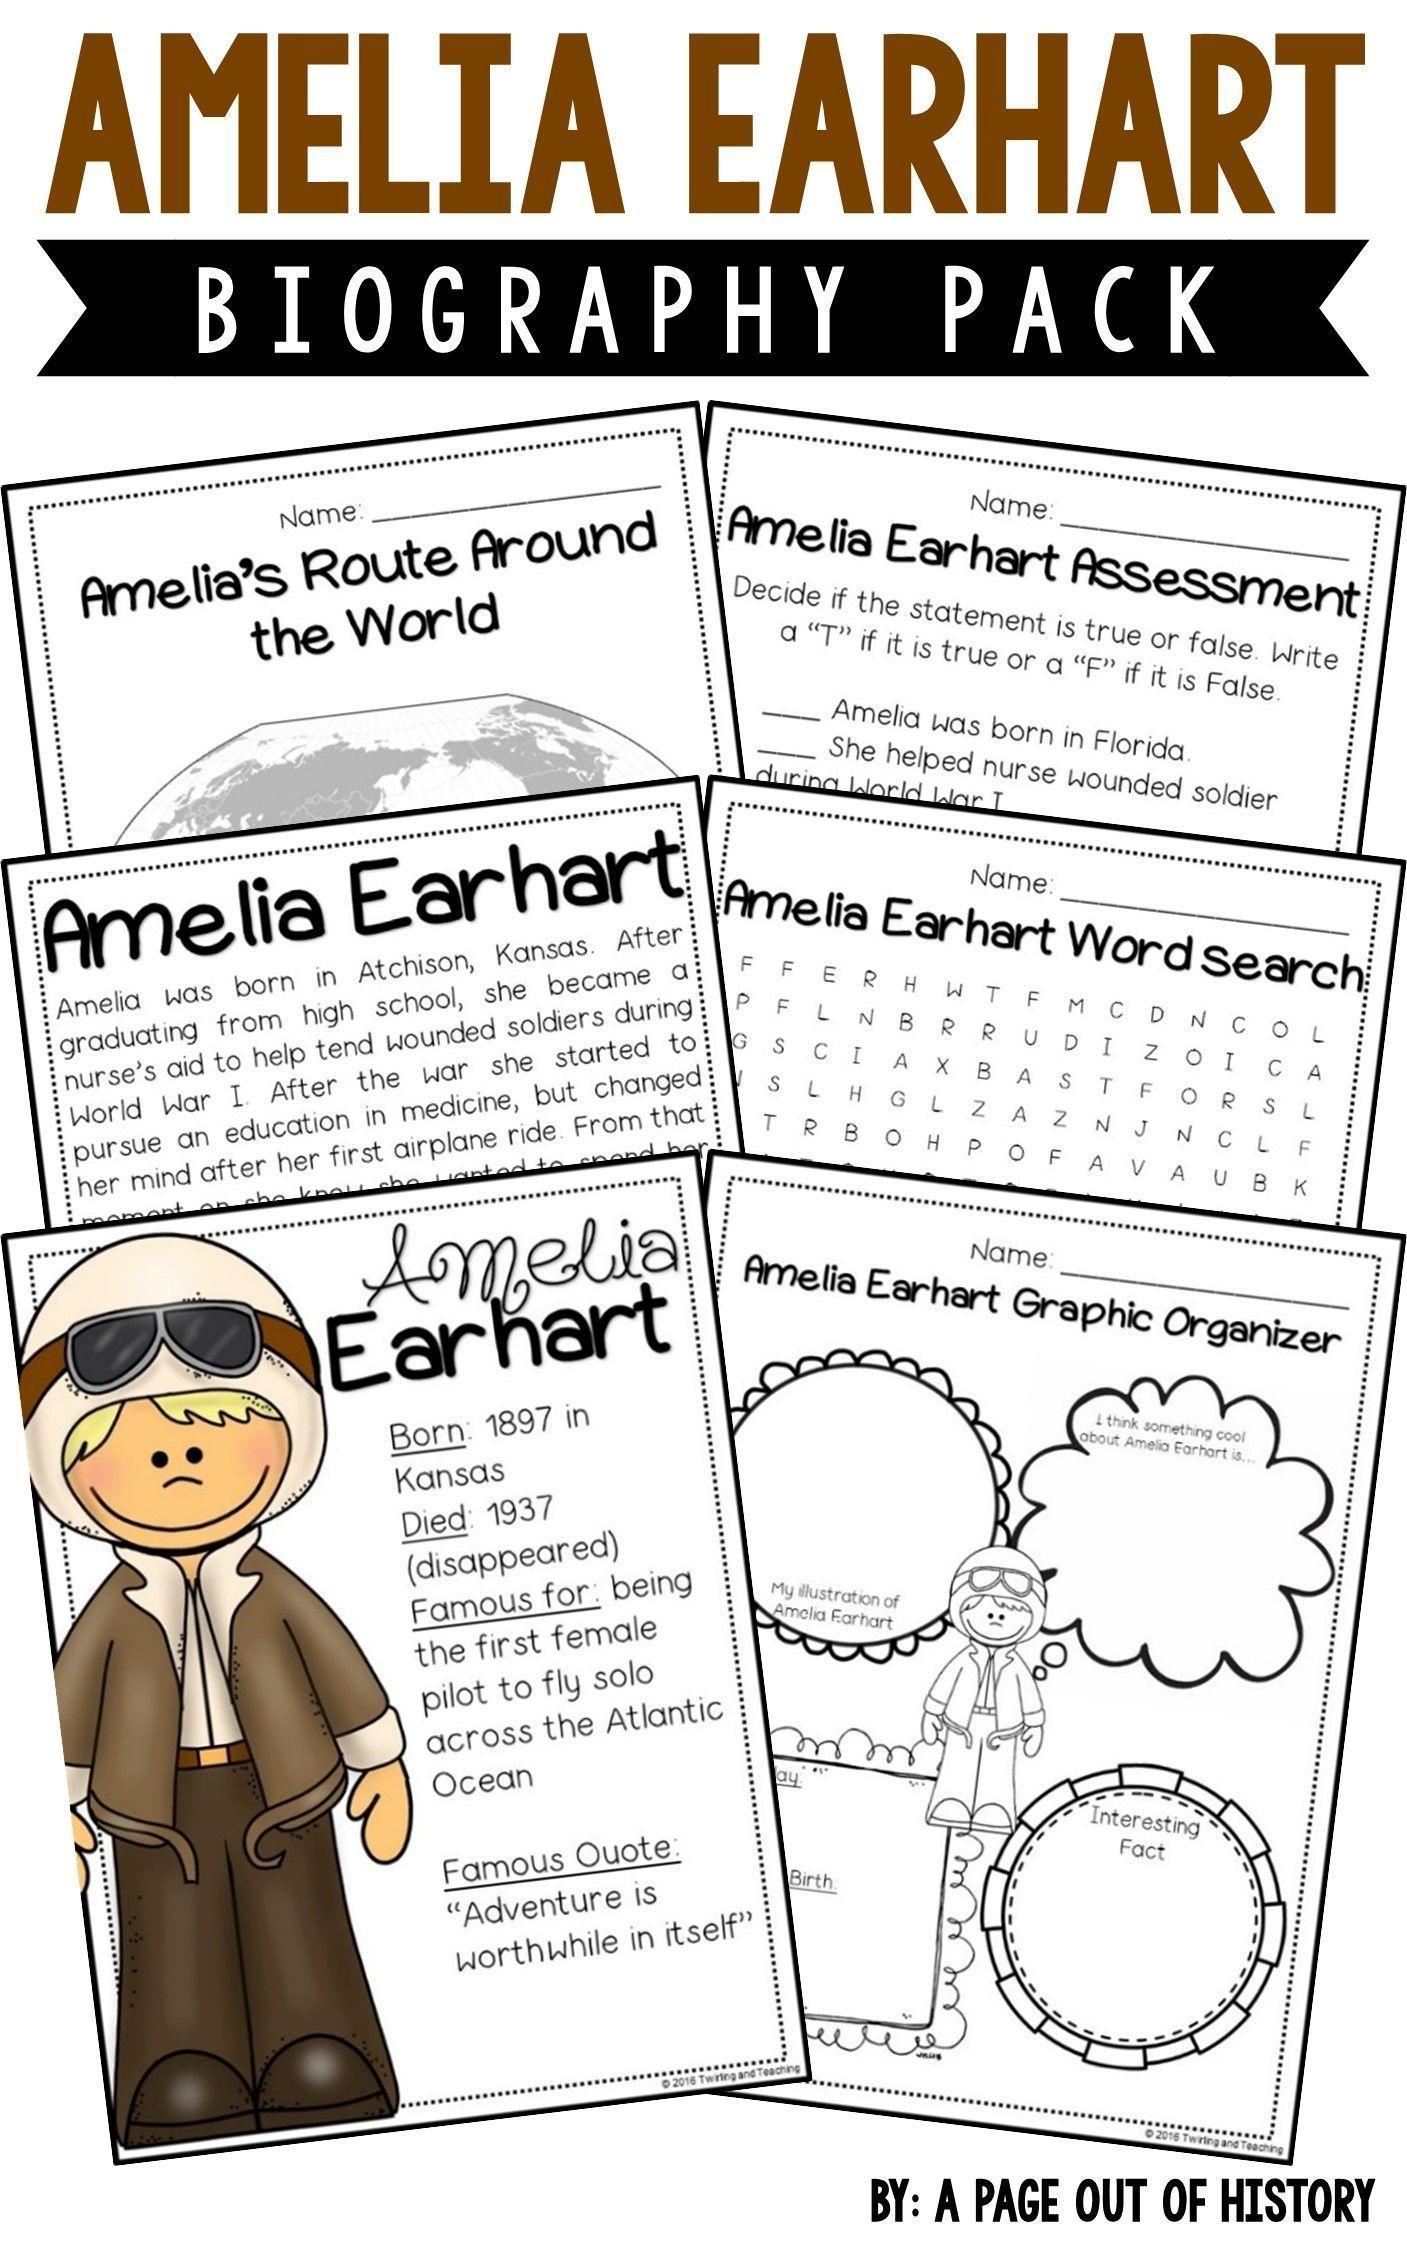 Amelia Earhart Biography Pack Women S History